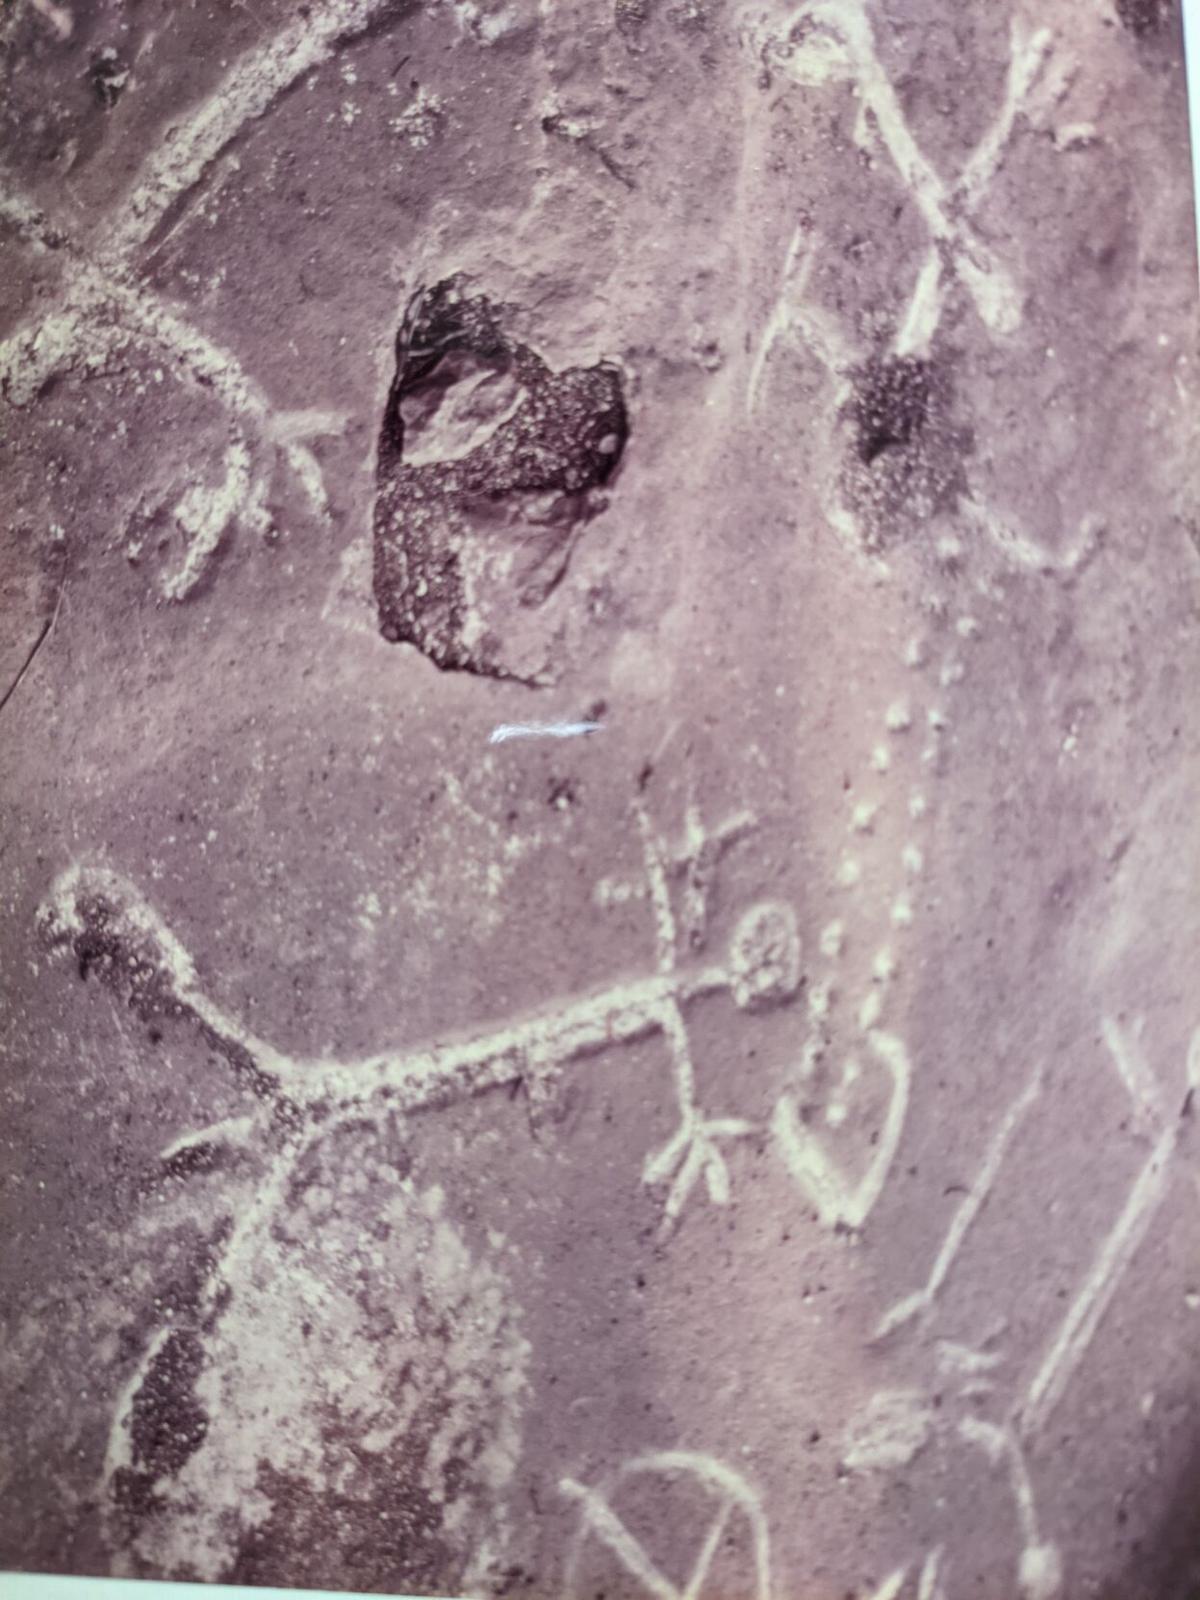 Tonkawa Falls petroglyph